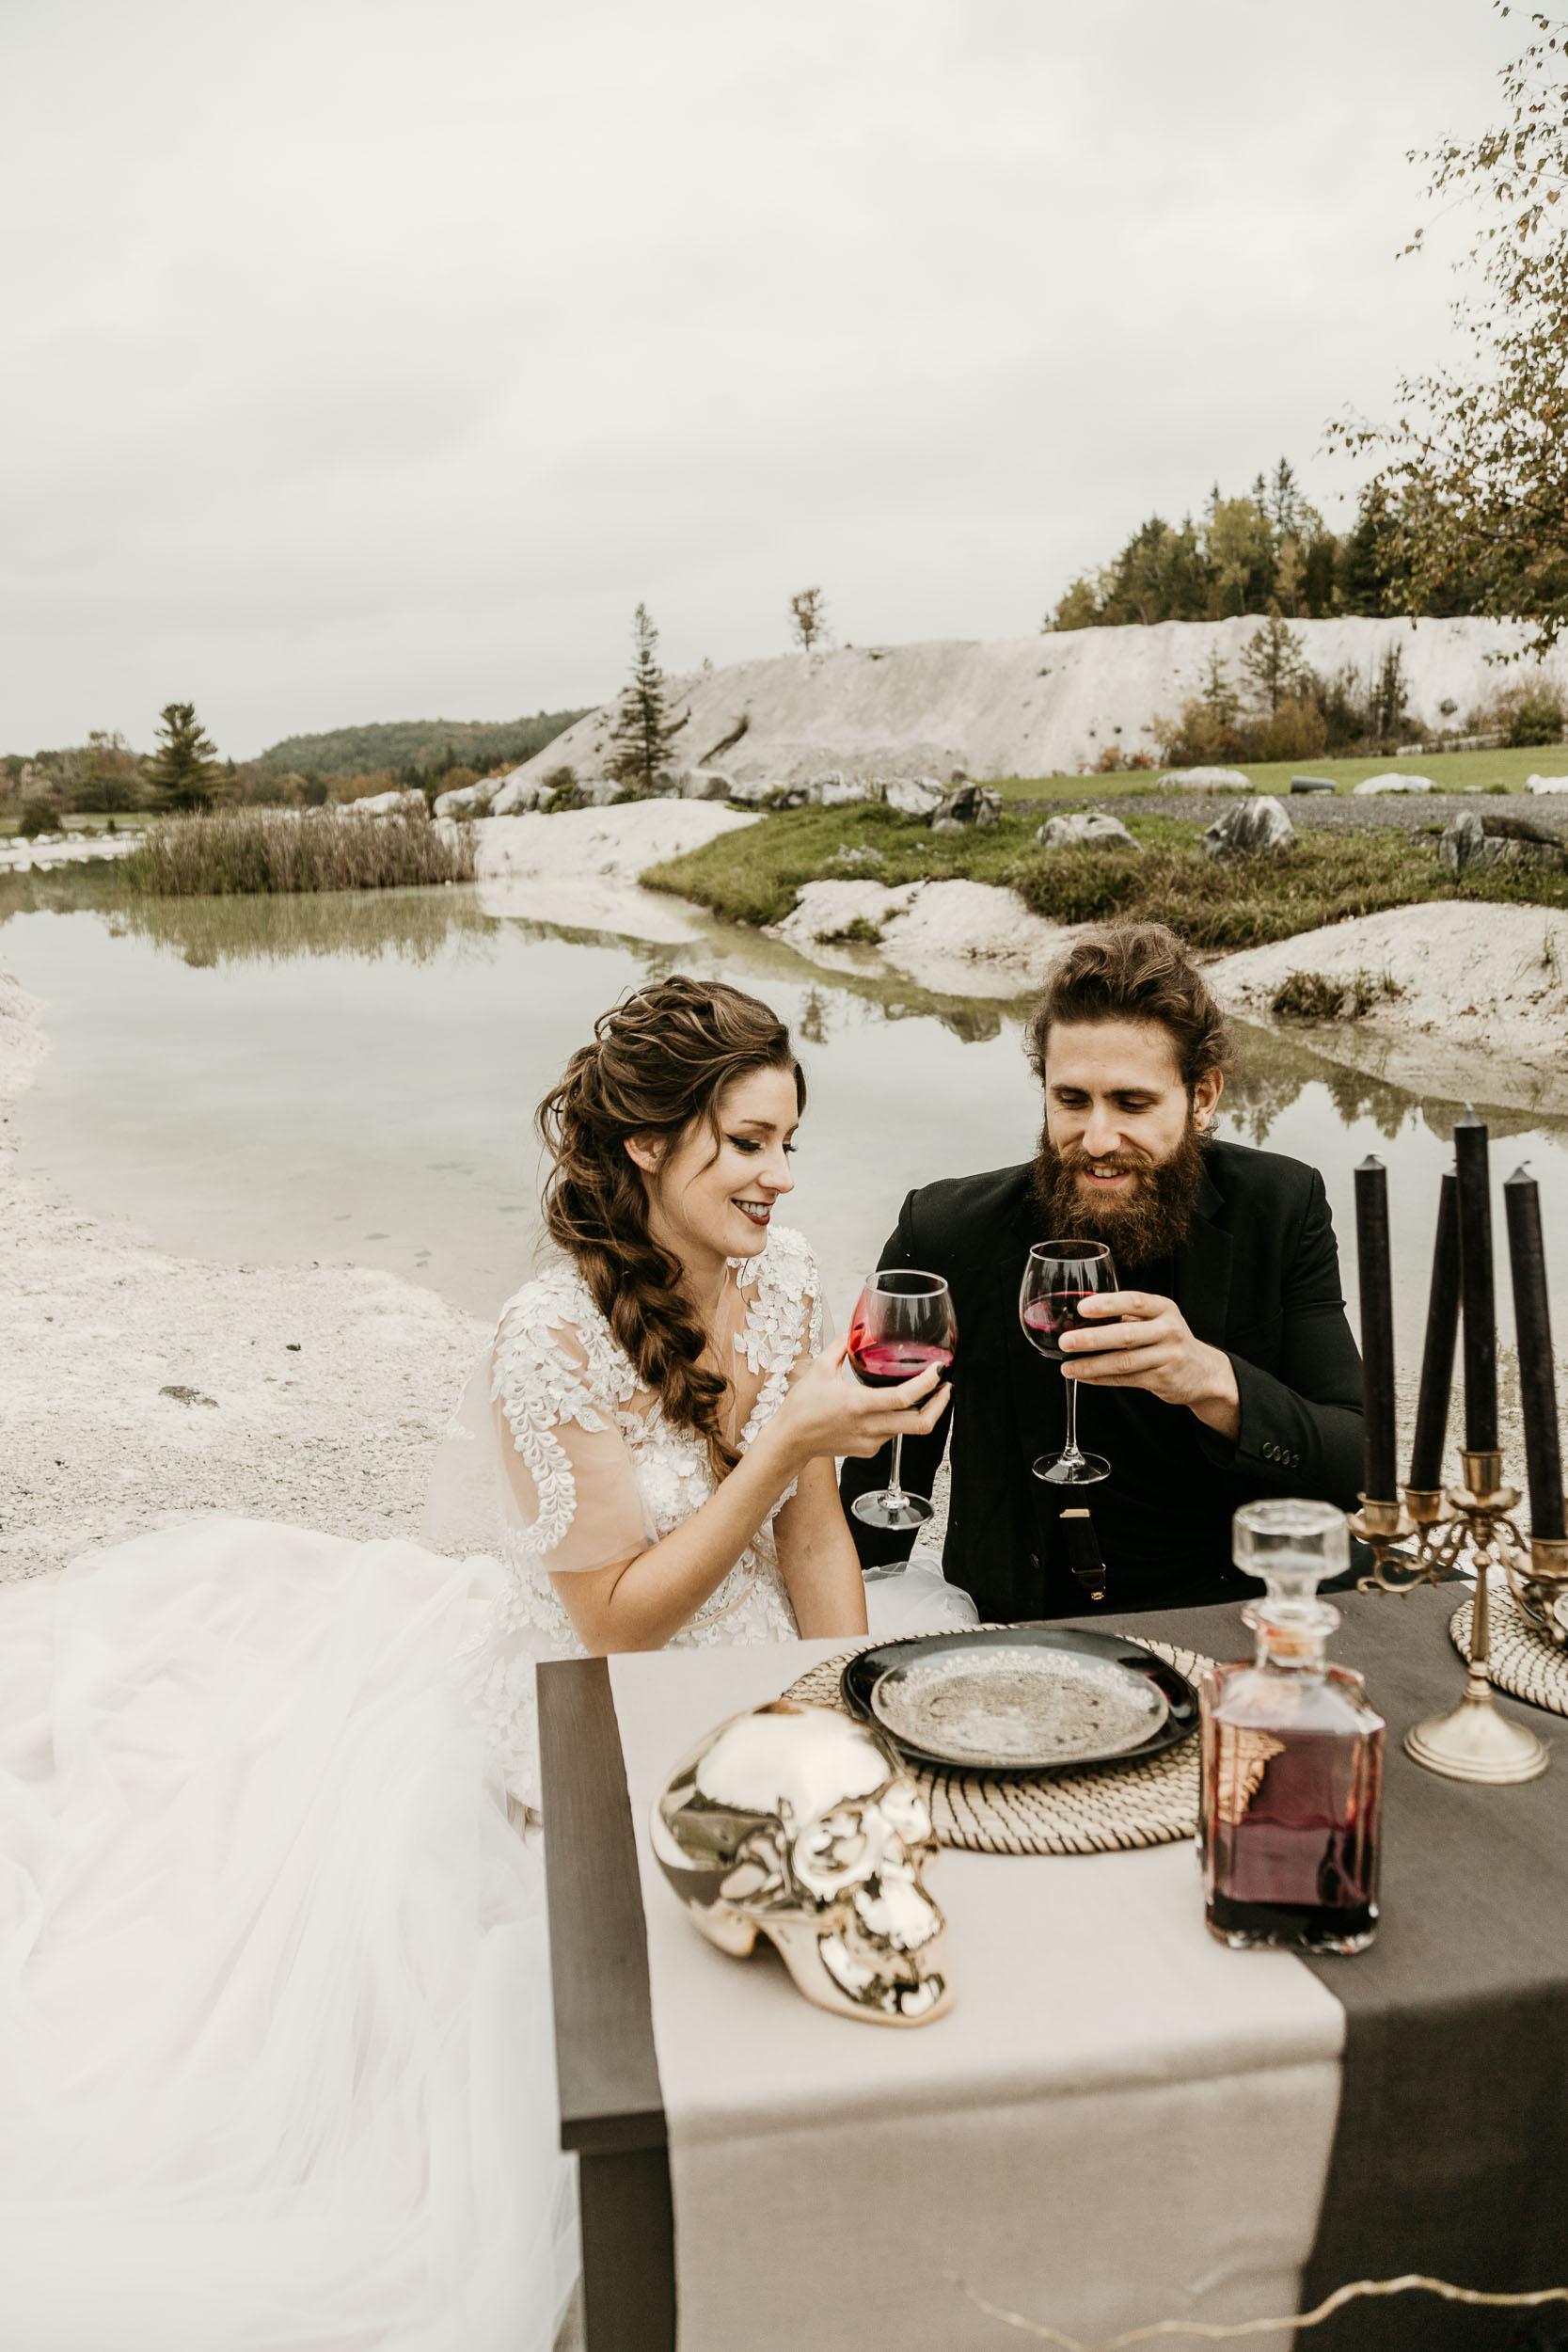 intimate-wedding-elopement-photographer-ottawa-toronto-0730.jpg